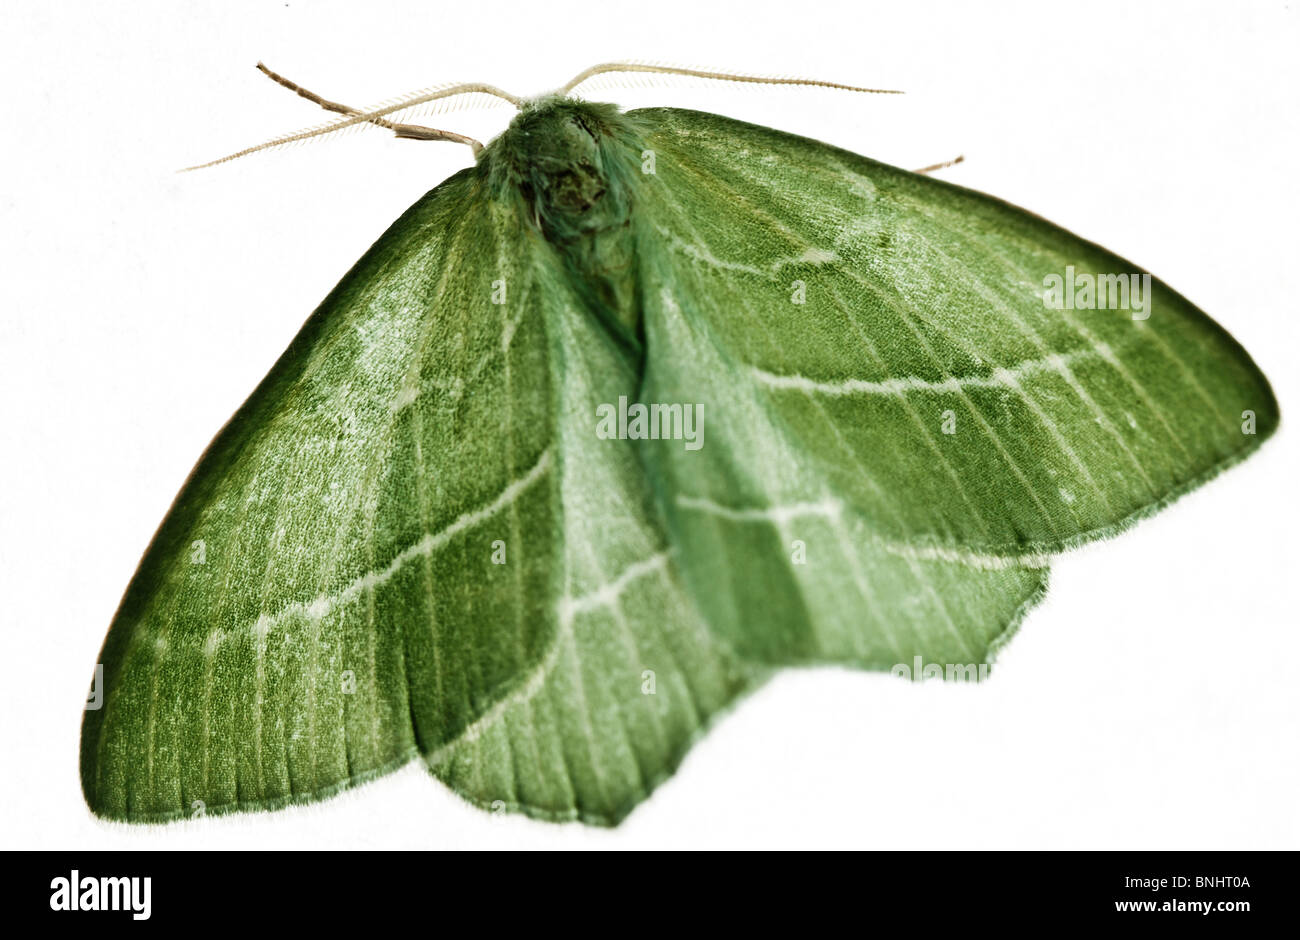 Geometra Papilionaria (großer Smaragd Nachtfalter) Stockbild